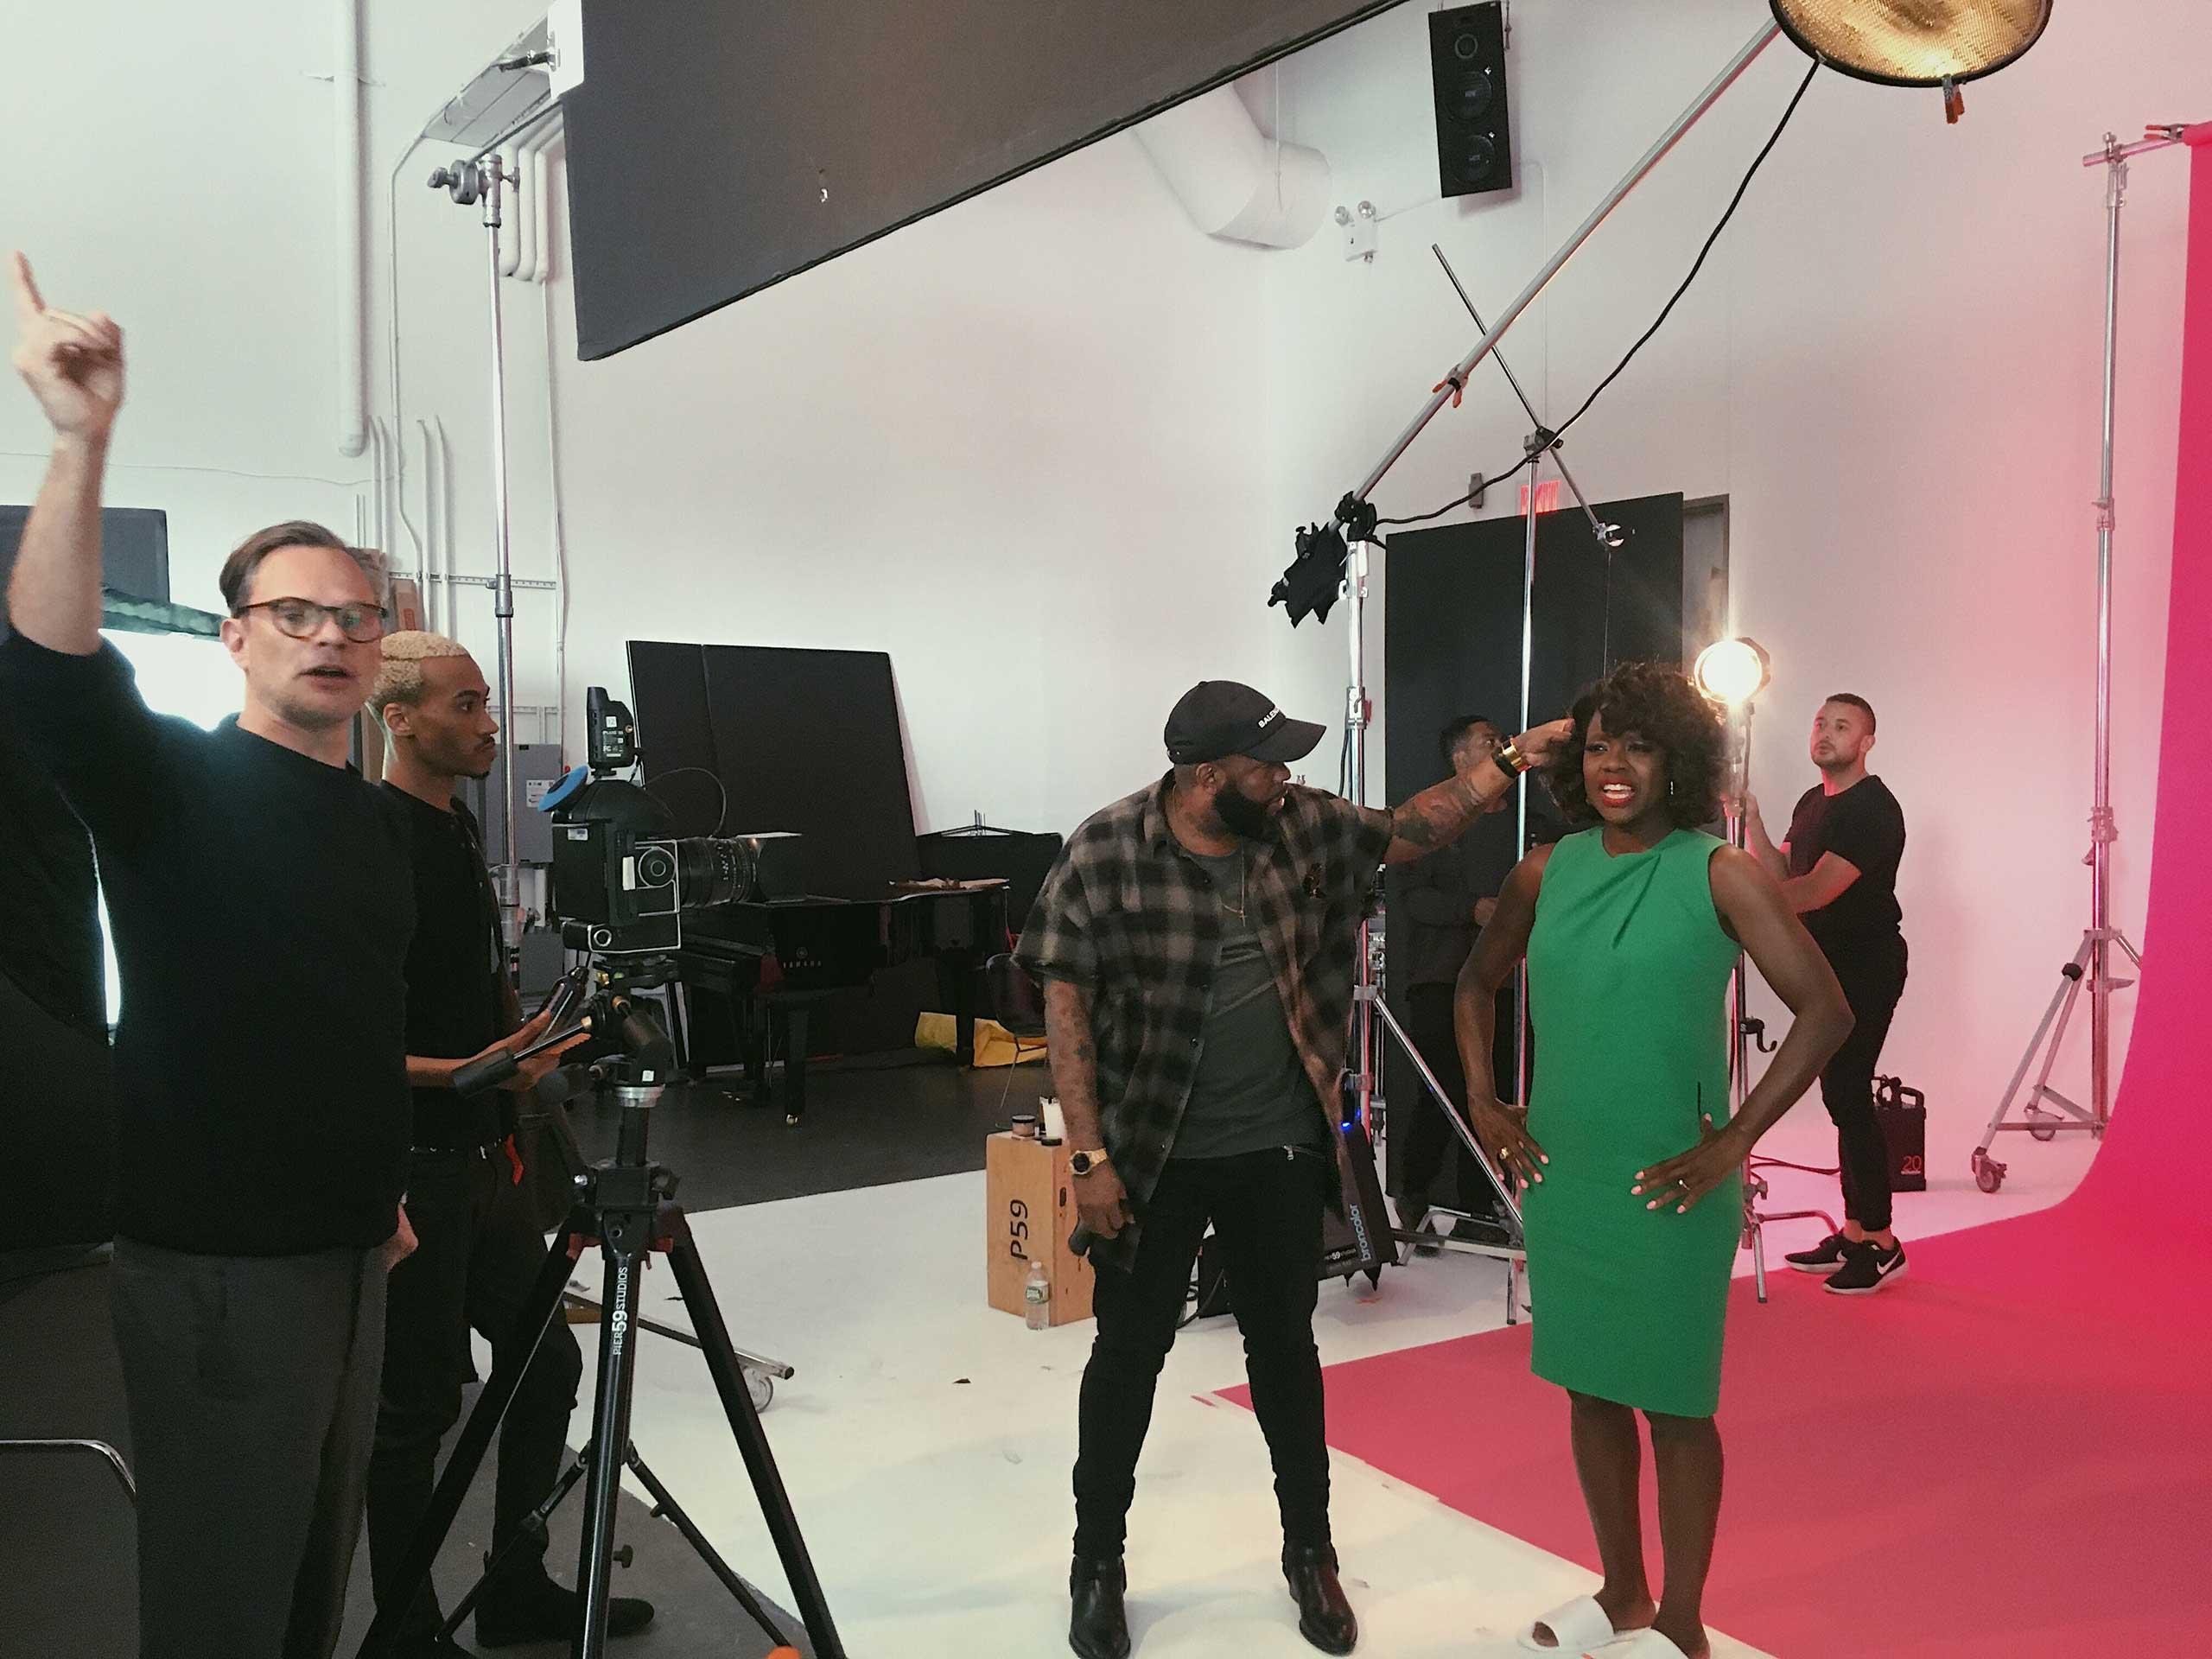 Miles Aldridge, hair stylist Yusef and Viola Davis on set for TIME 100.